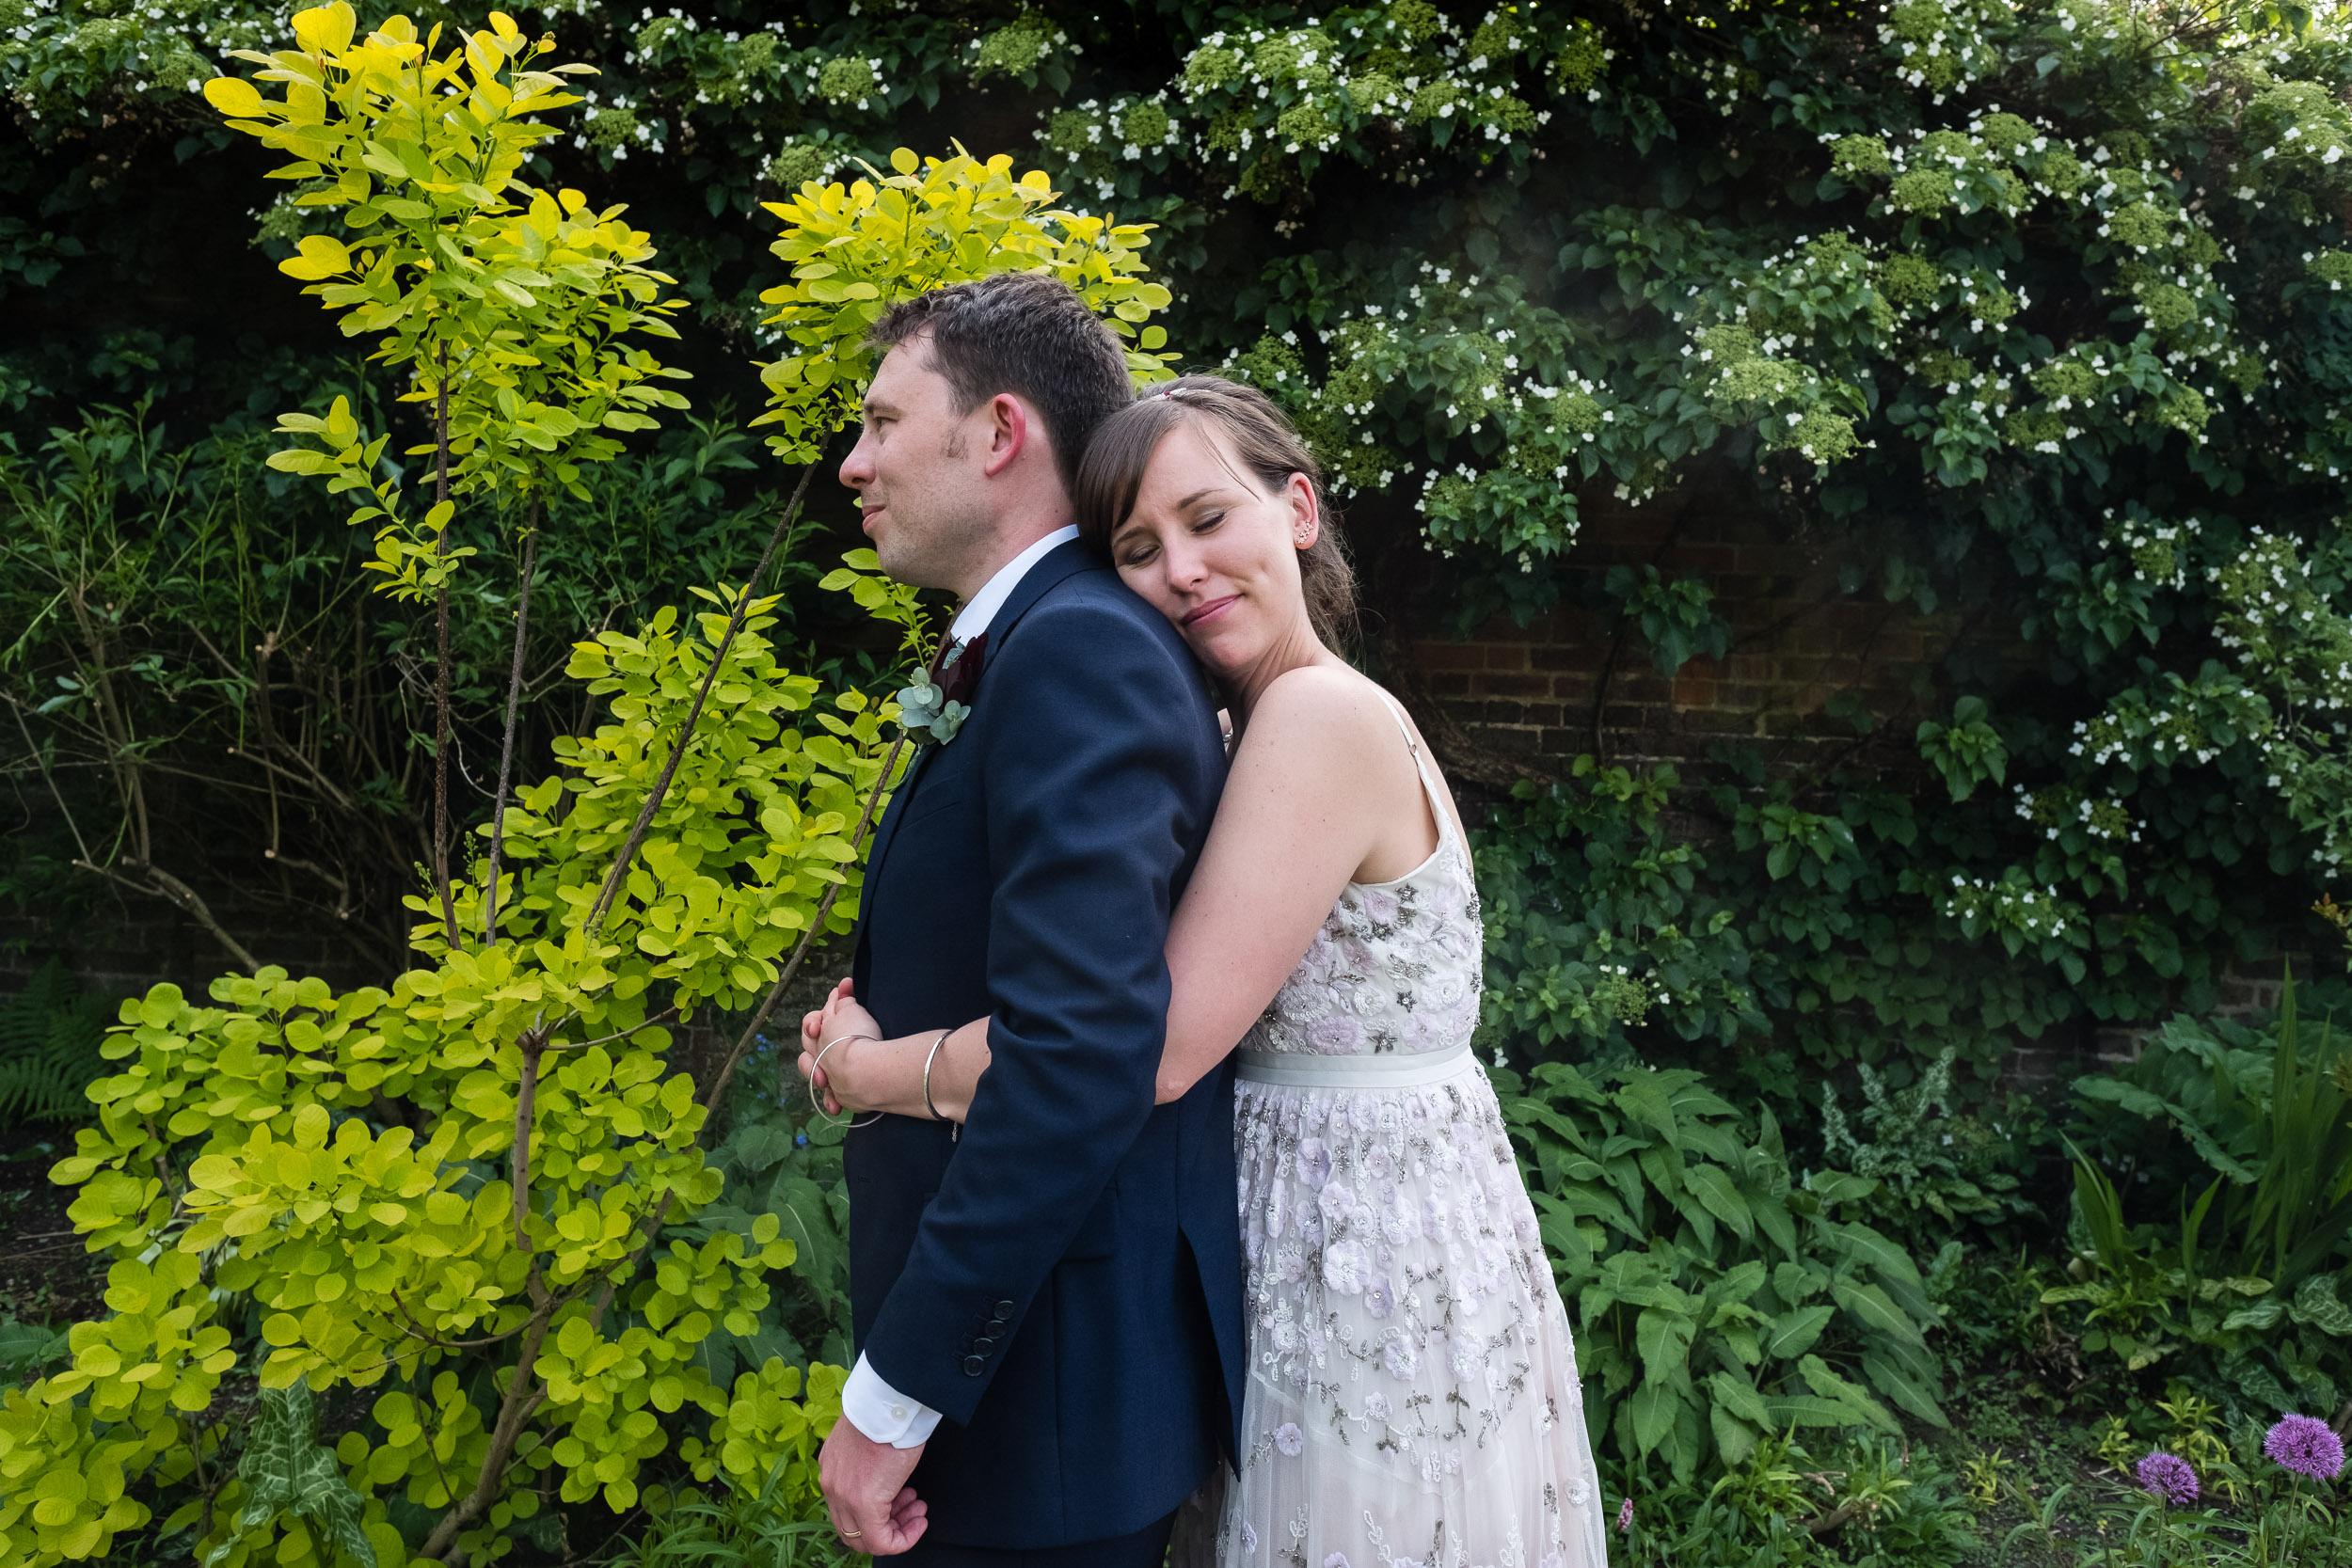 brockwell-lido-brixton-herne-hill-wedding-286.jpg